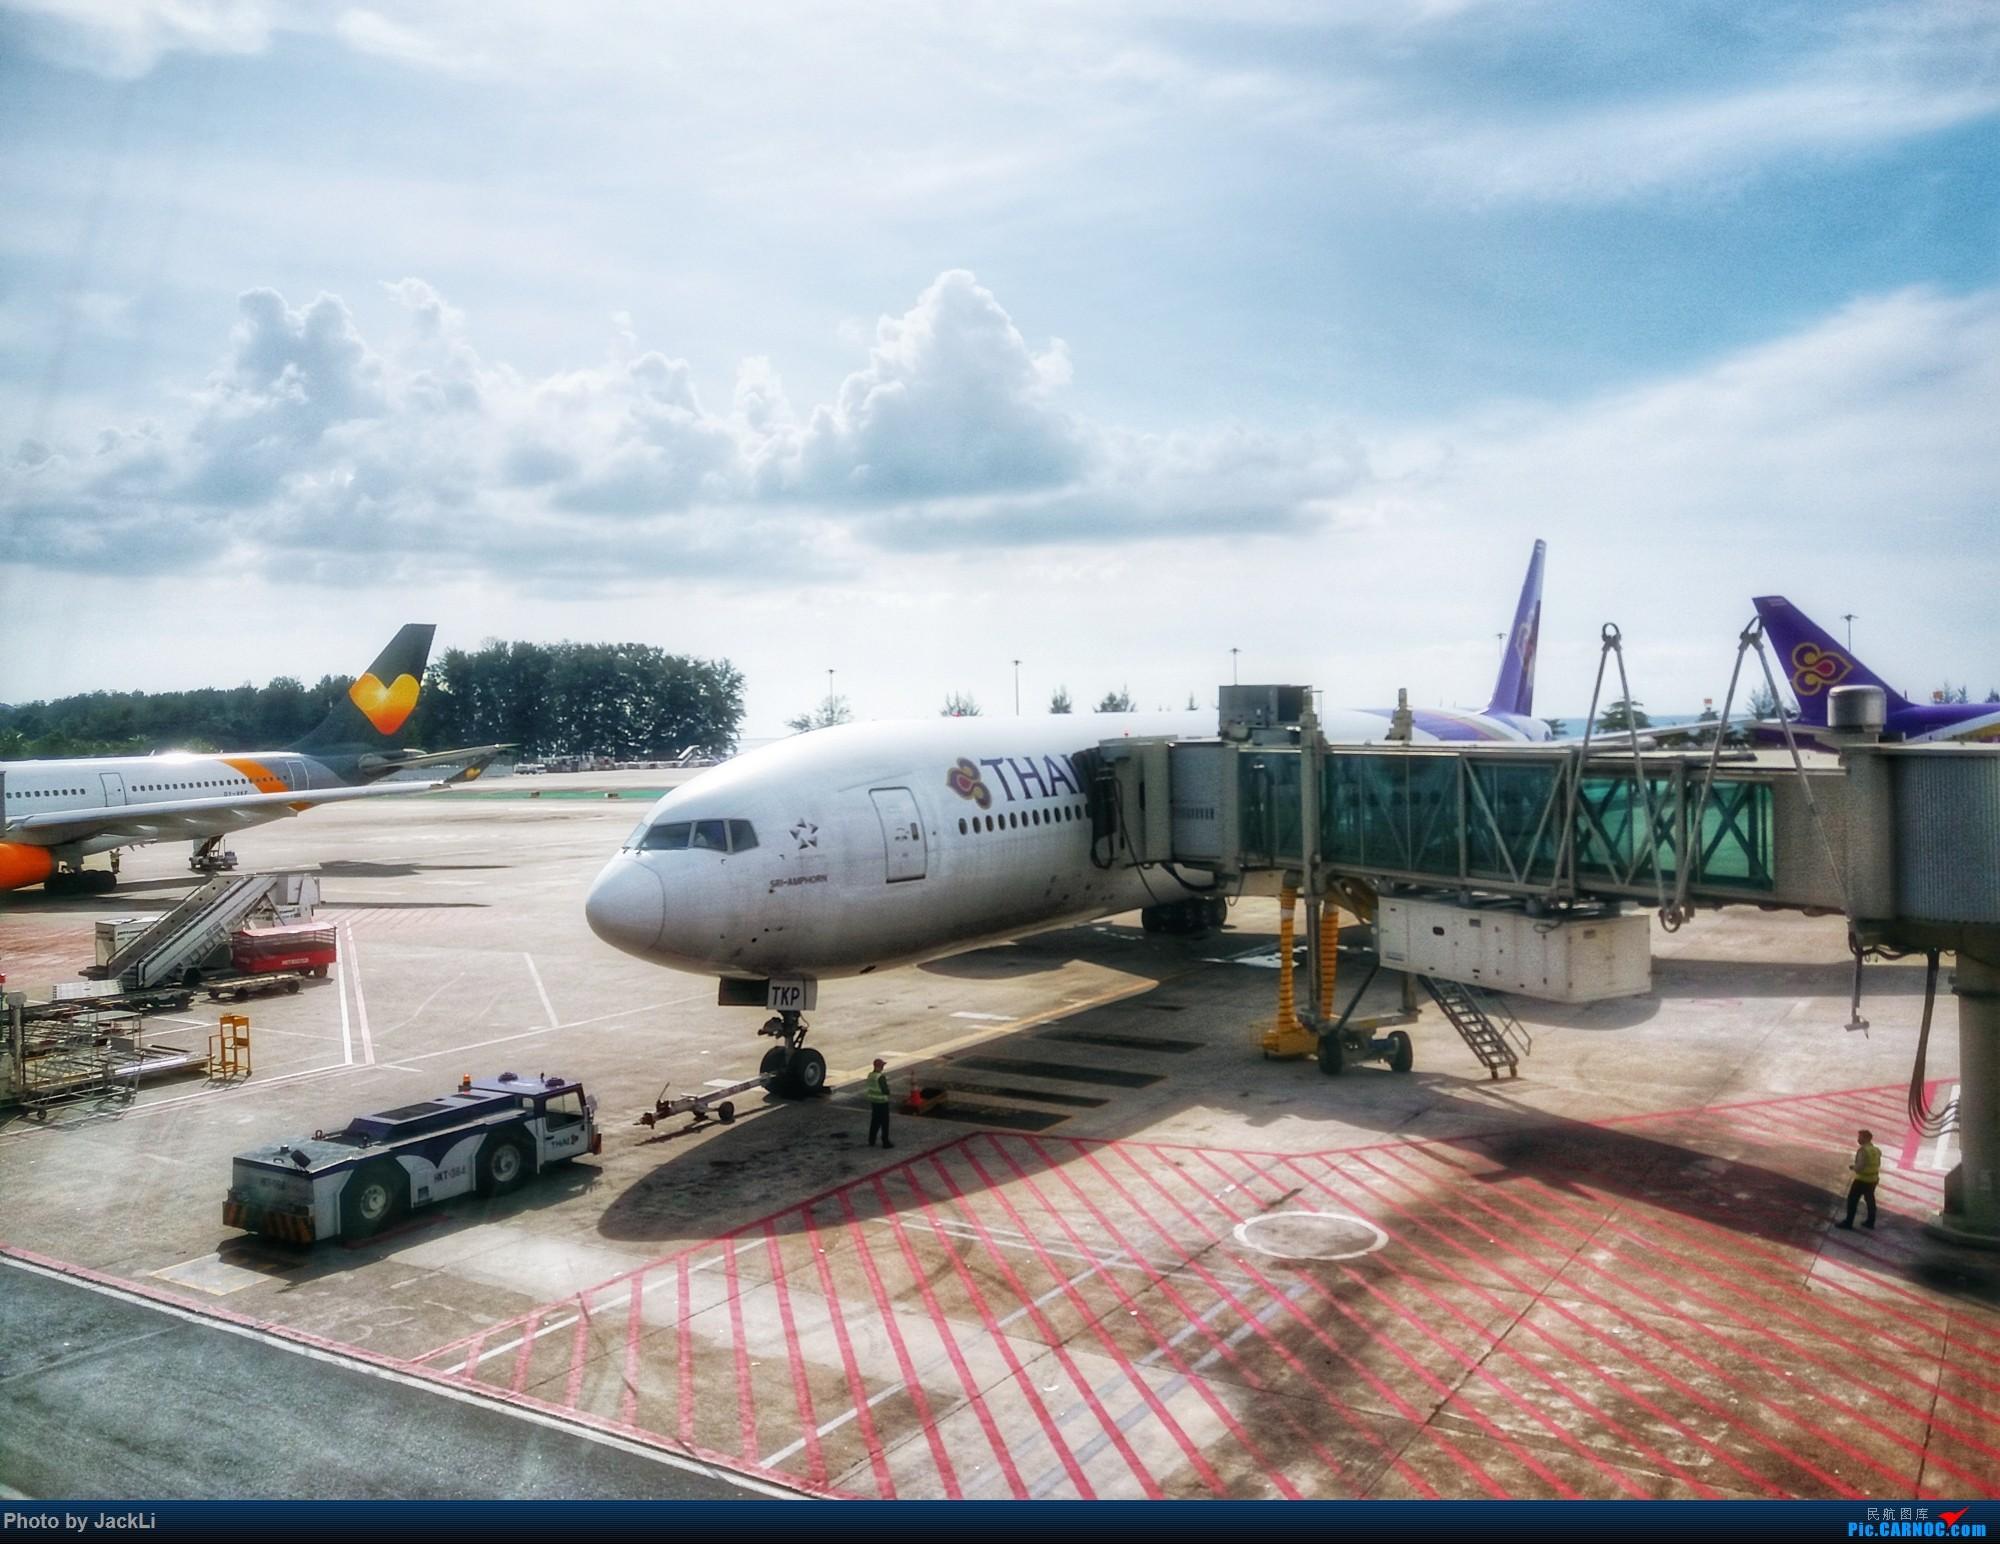 Re:[原创]【JackLi】亚洲圣马丁~普吉岛机场拍机 BOEING 777-300ER HS-TKP 泰国普吉机场